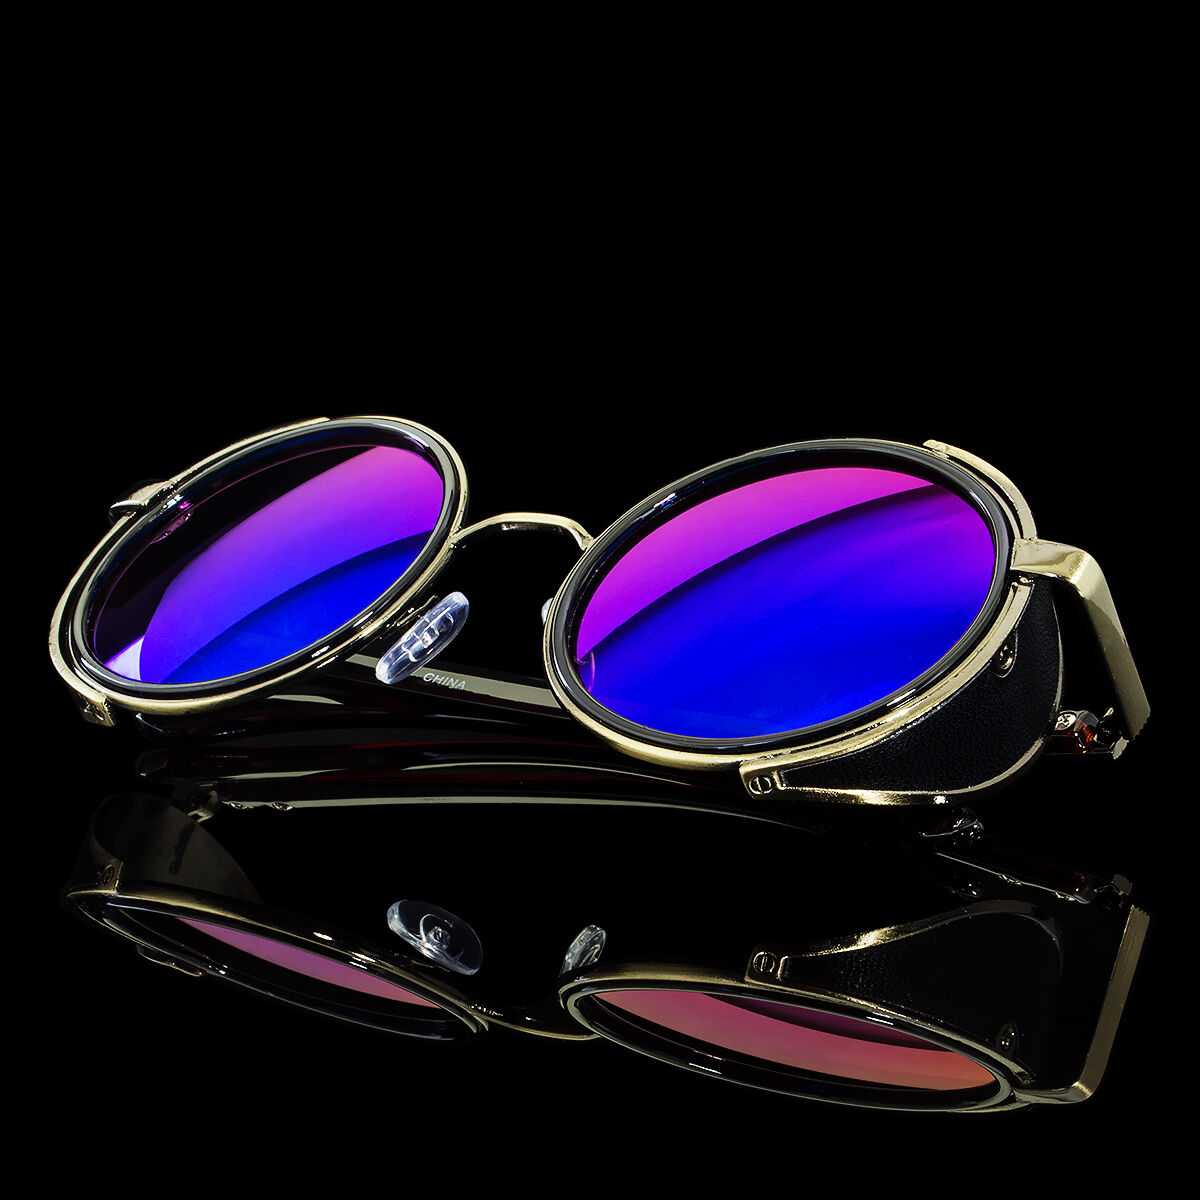 5547d7801fb7 Vintage Retro Mirror Round SUN Glasses Goggles Steampunk Punk Sunglasses  Unise 2 2 of 7 ...